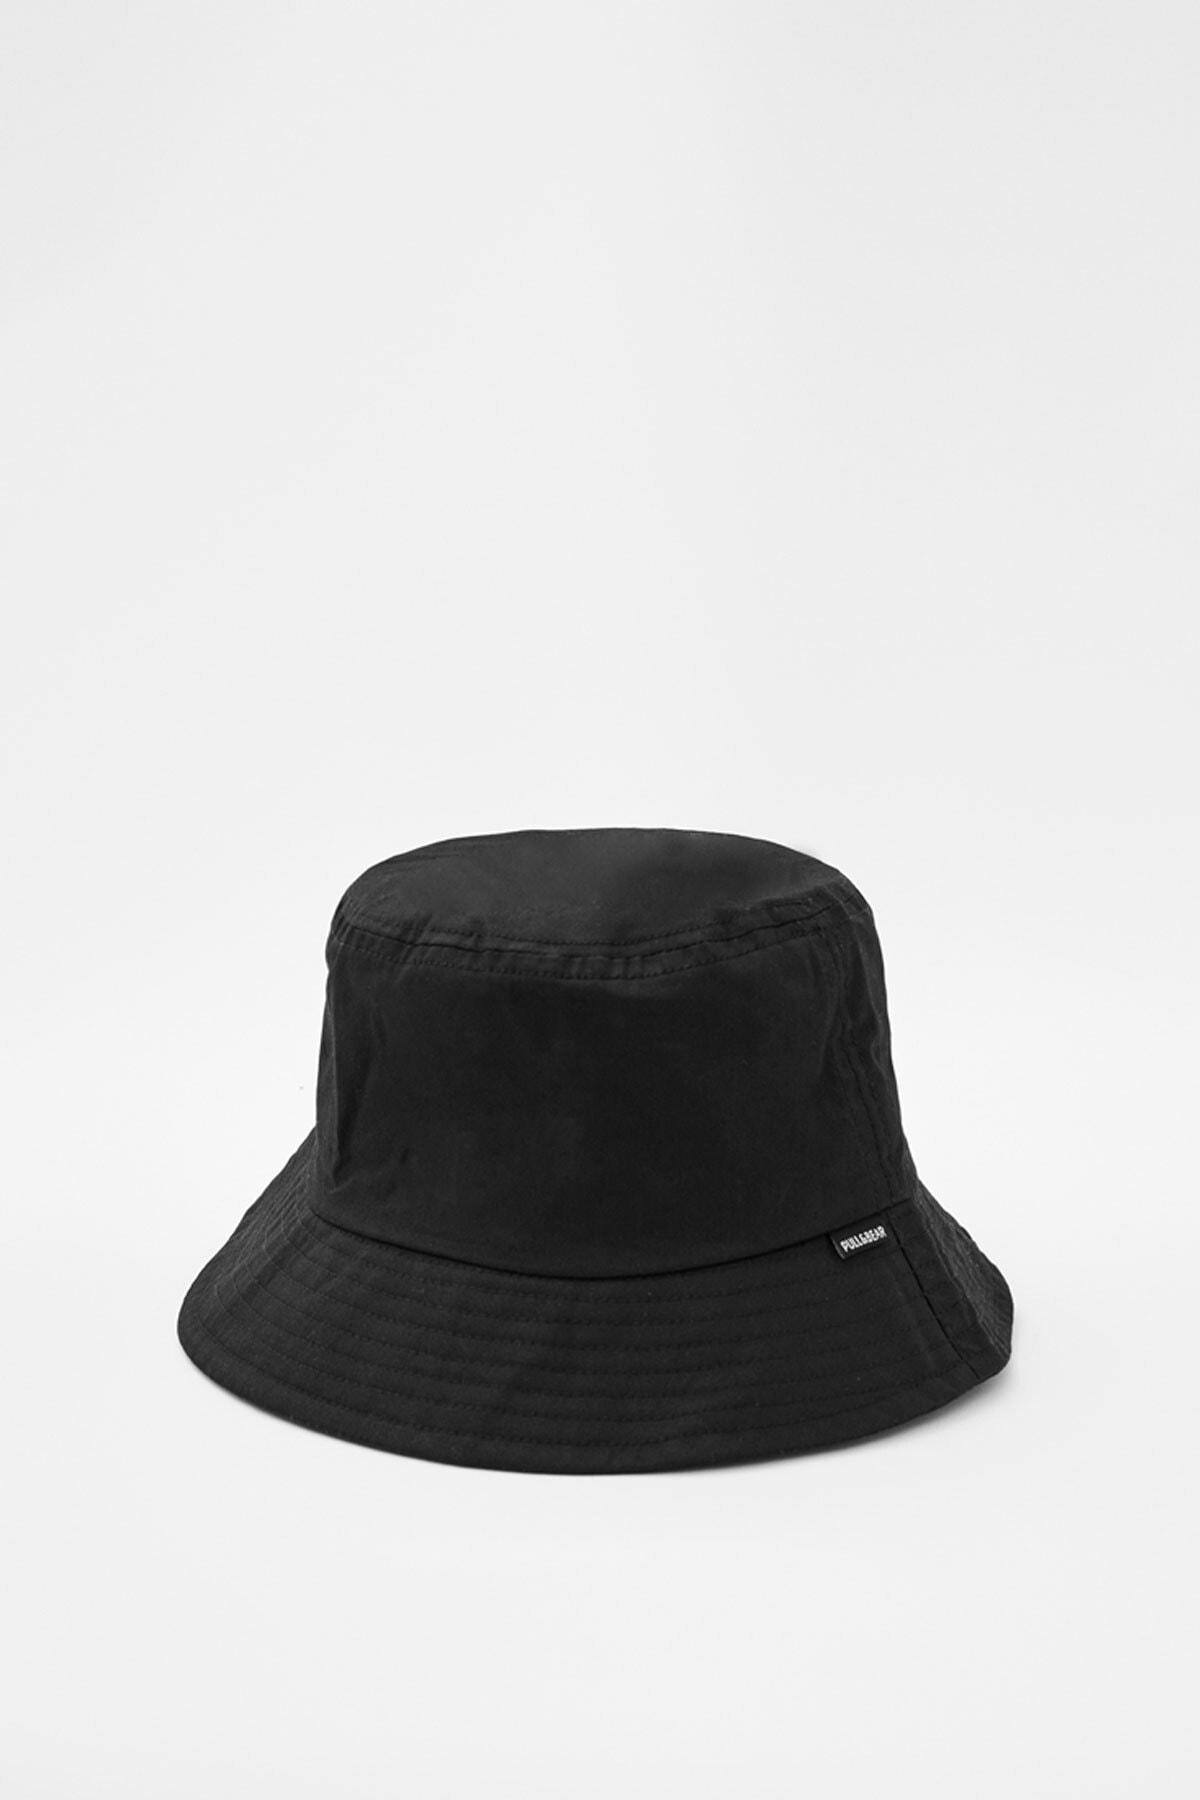 قیمت کلاه مردانه برند Pull & Bear رنگ مشکی کد ty40932364